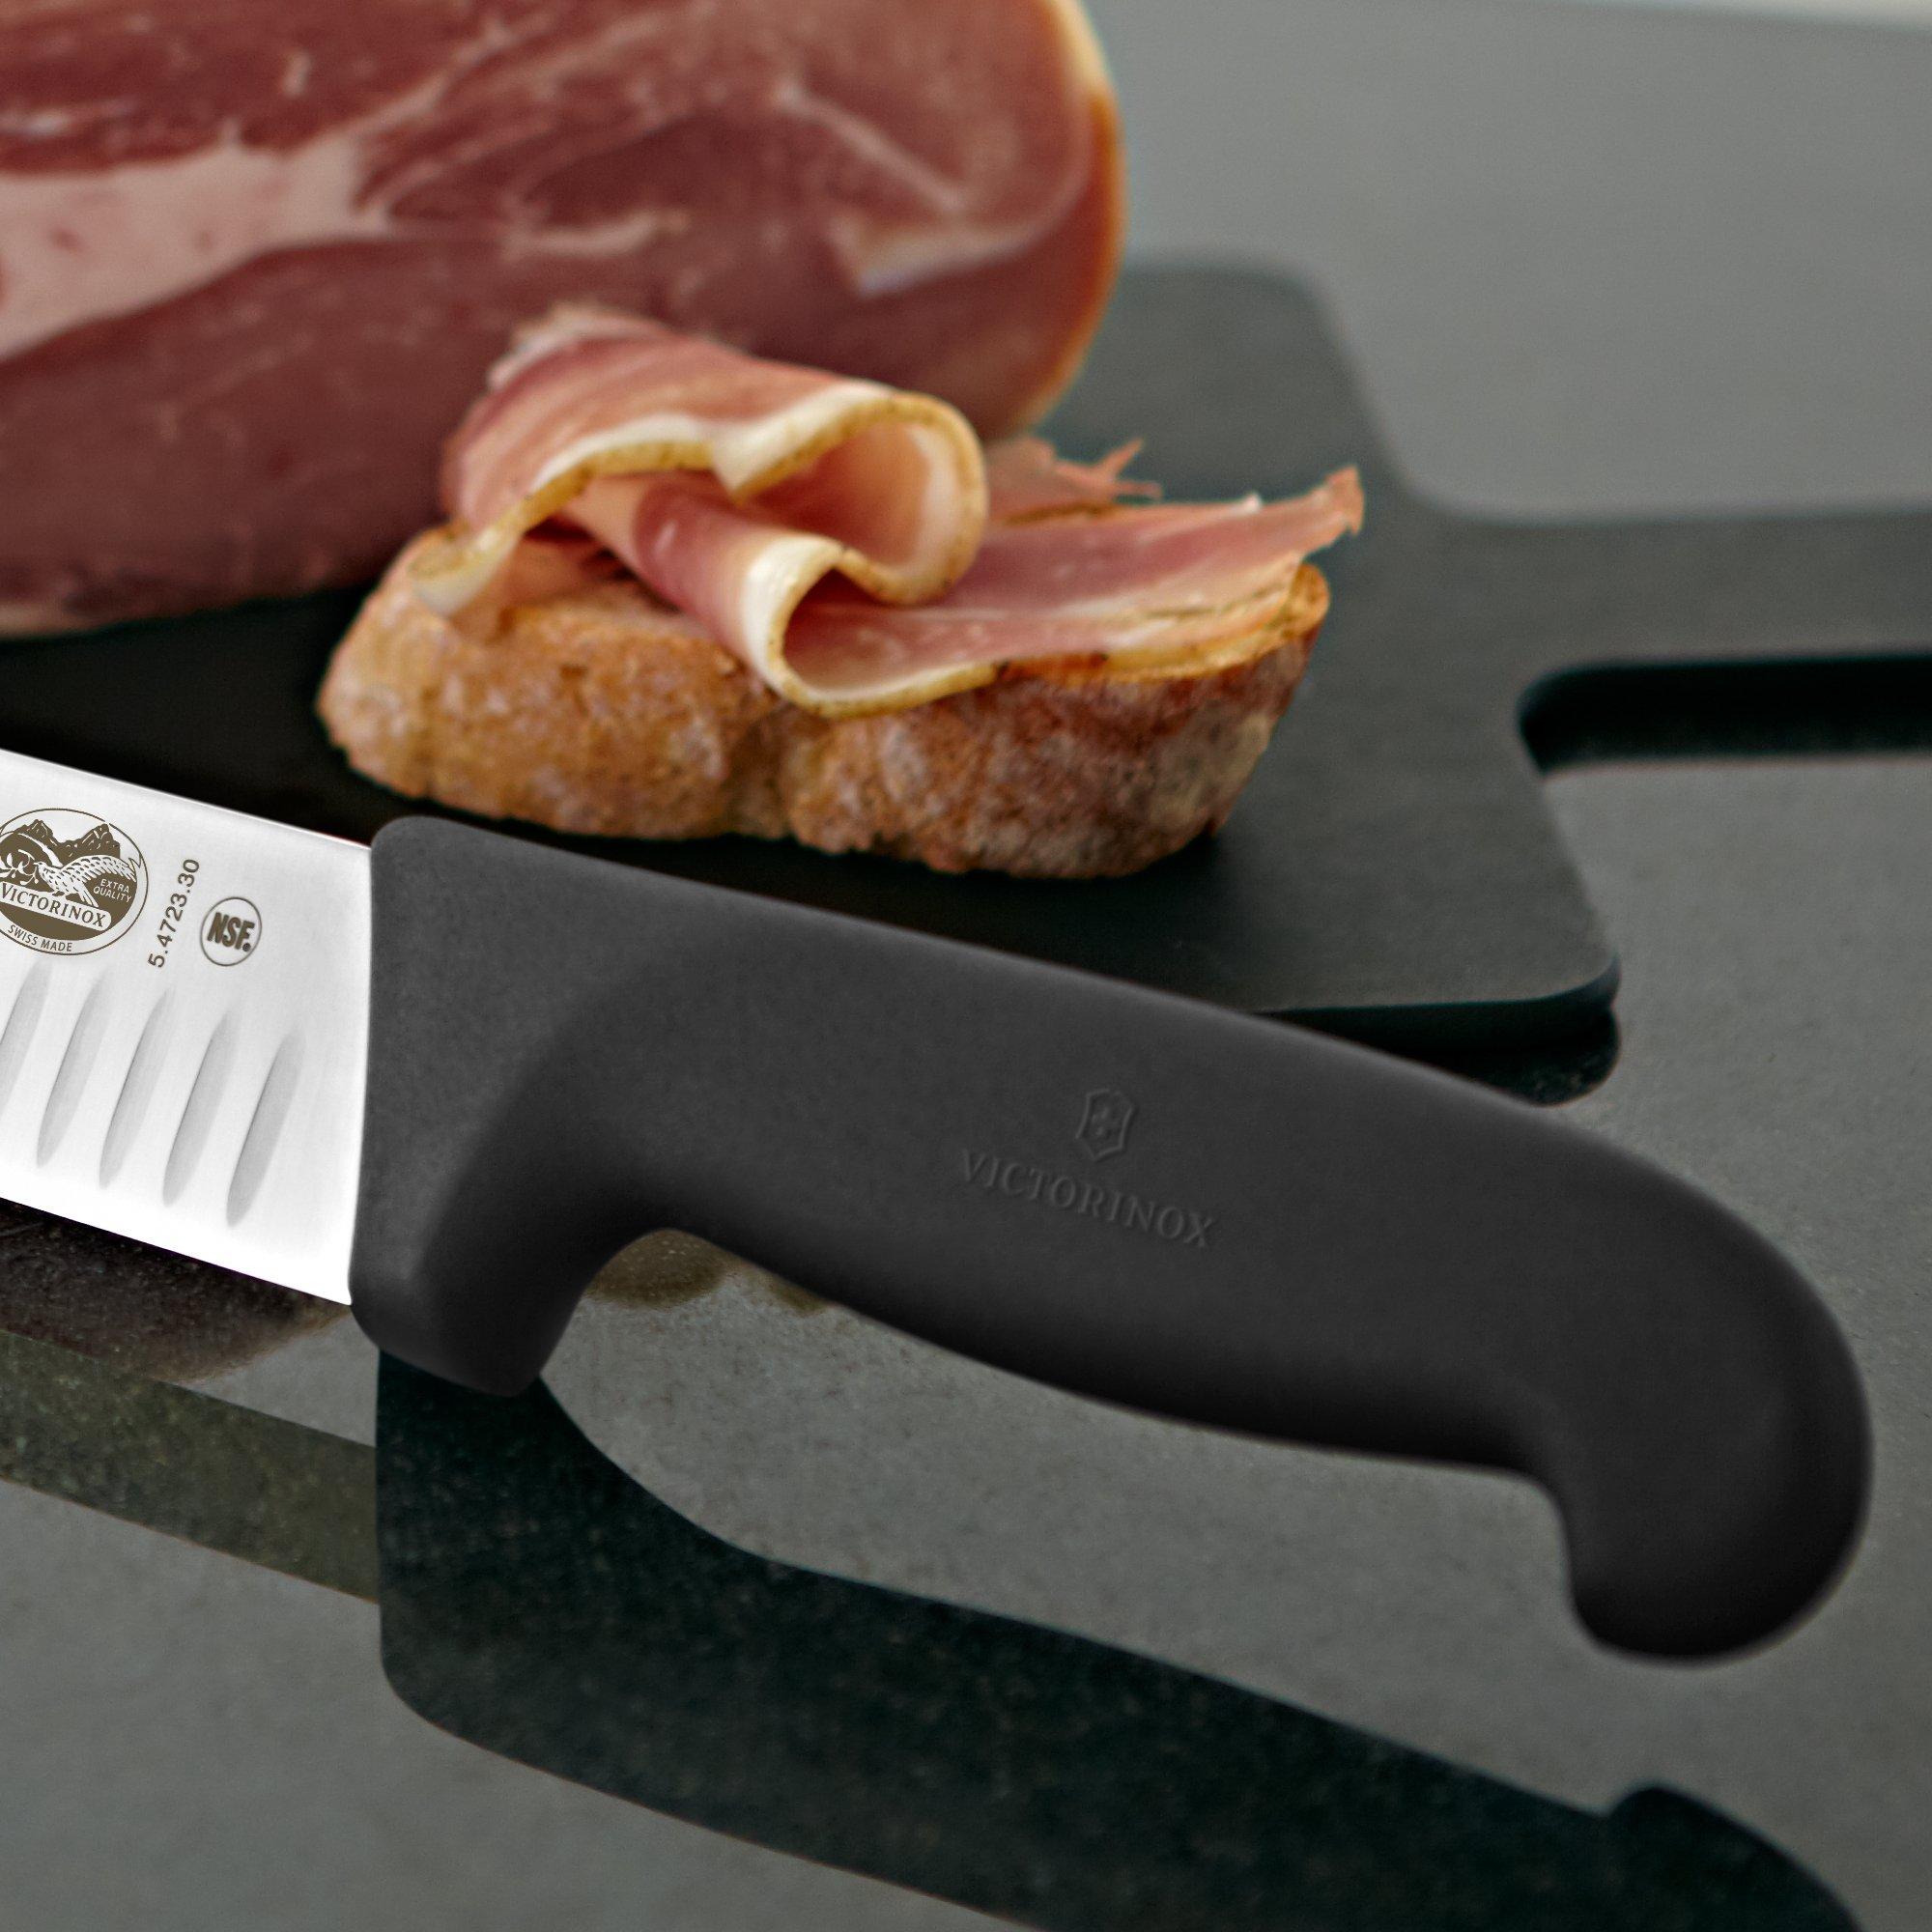 Victorinox 12 Inch Fibrox Pro Slicing Knife with Granton Blade by Victorinox (Image #4)